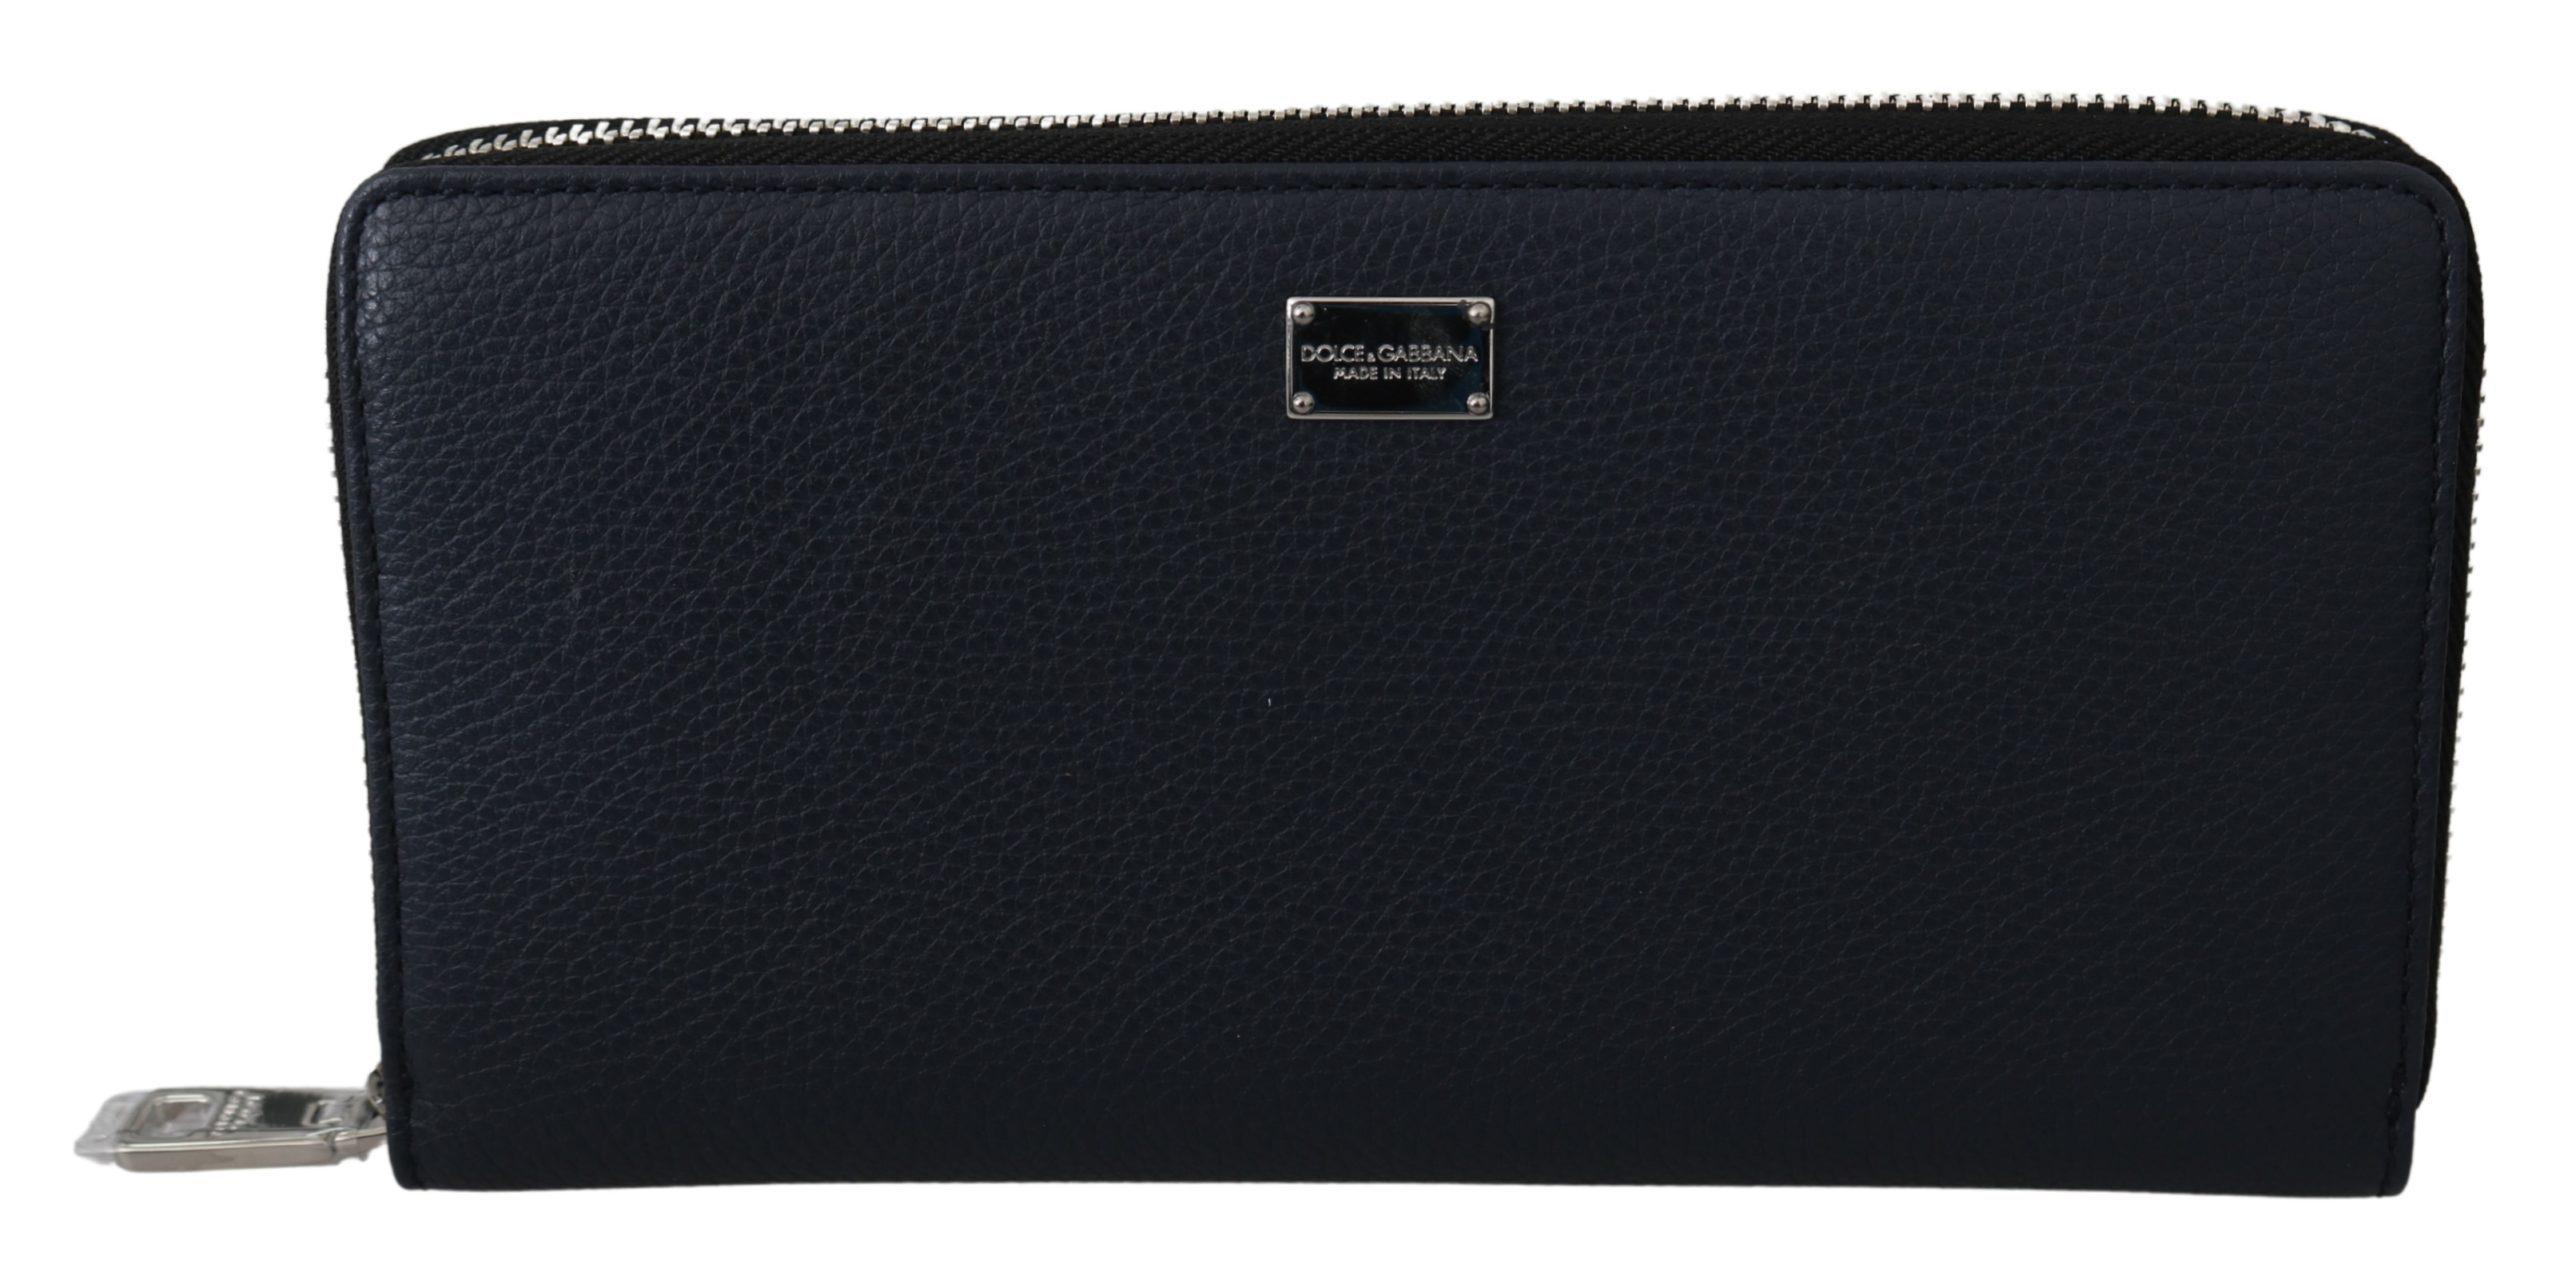 Dolce & Gabbana Men's Dauphine Leather Continental Wallet Blue VAS9704